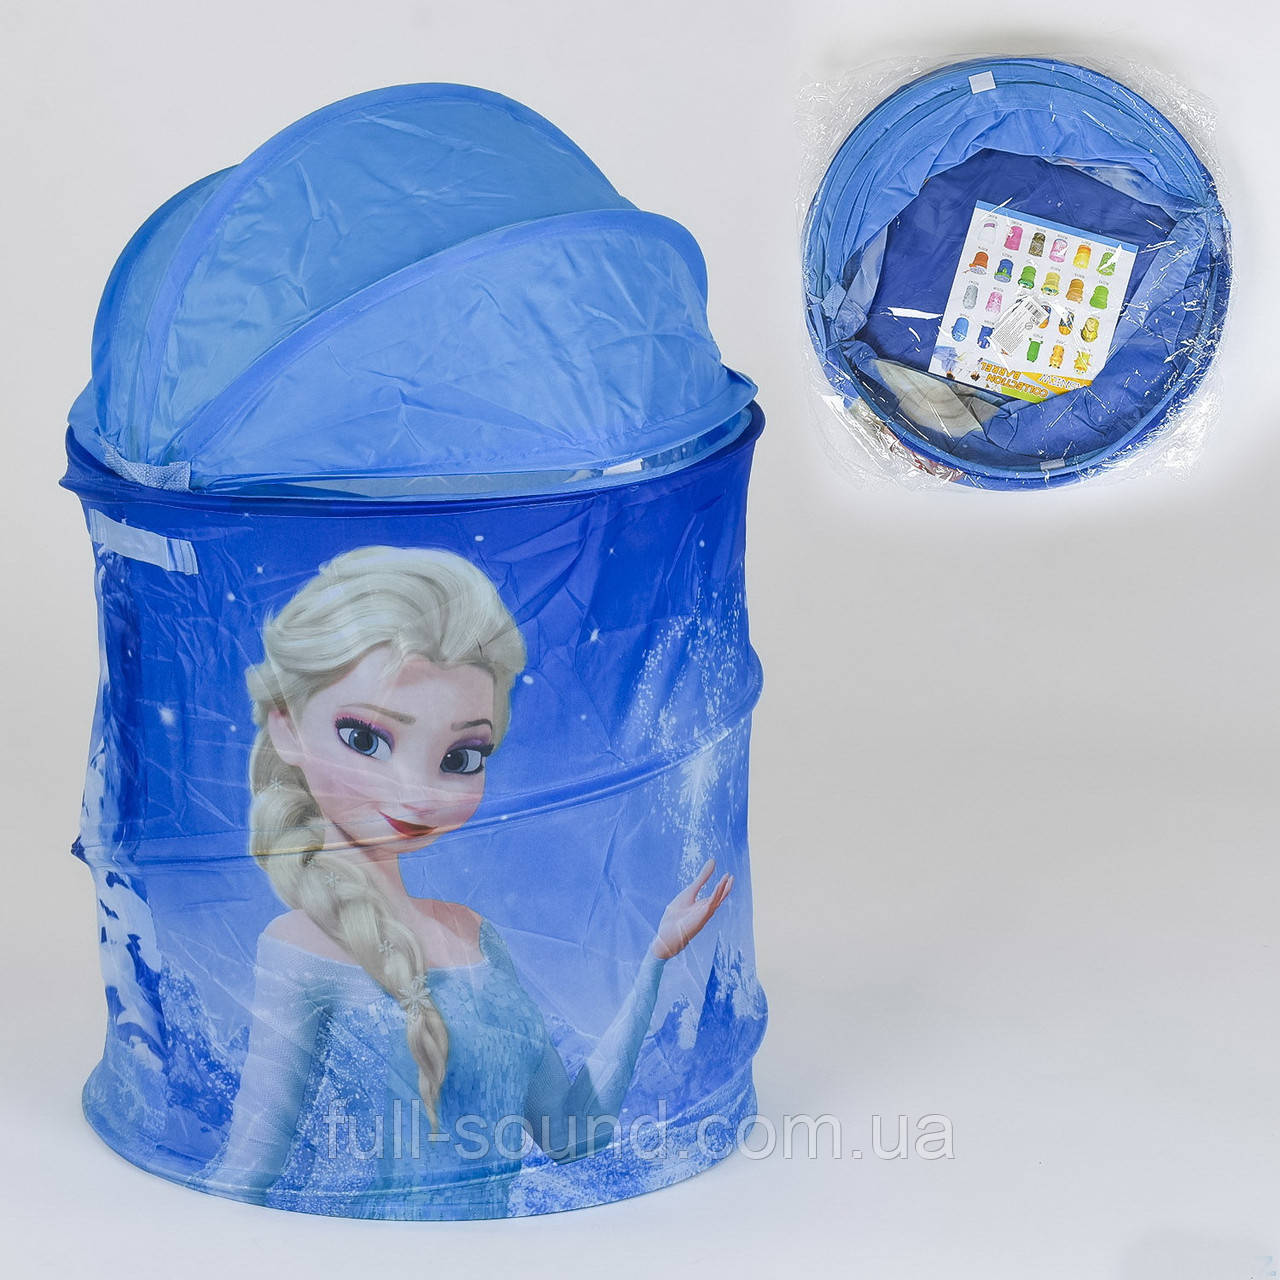 Корзина для игрушек frozen 3659